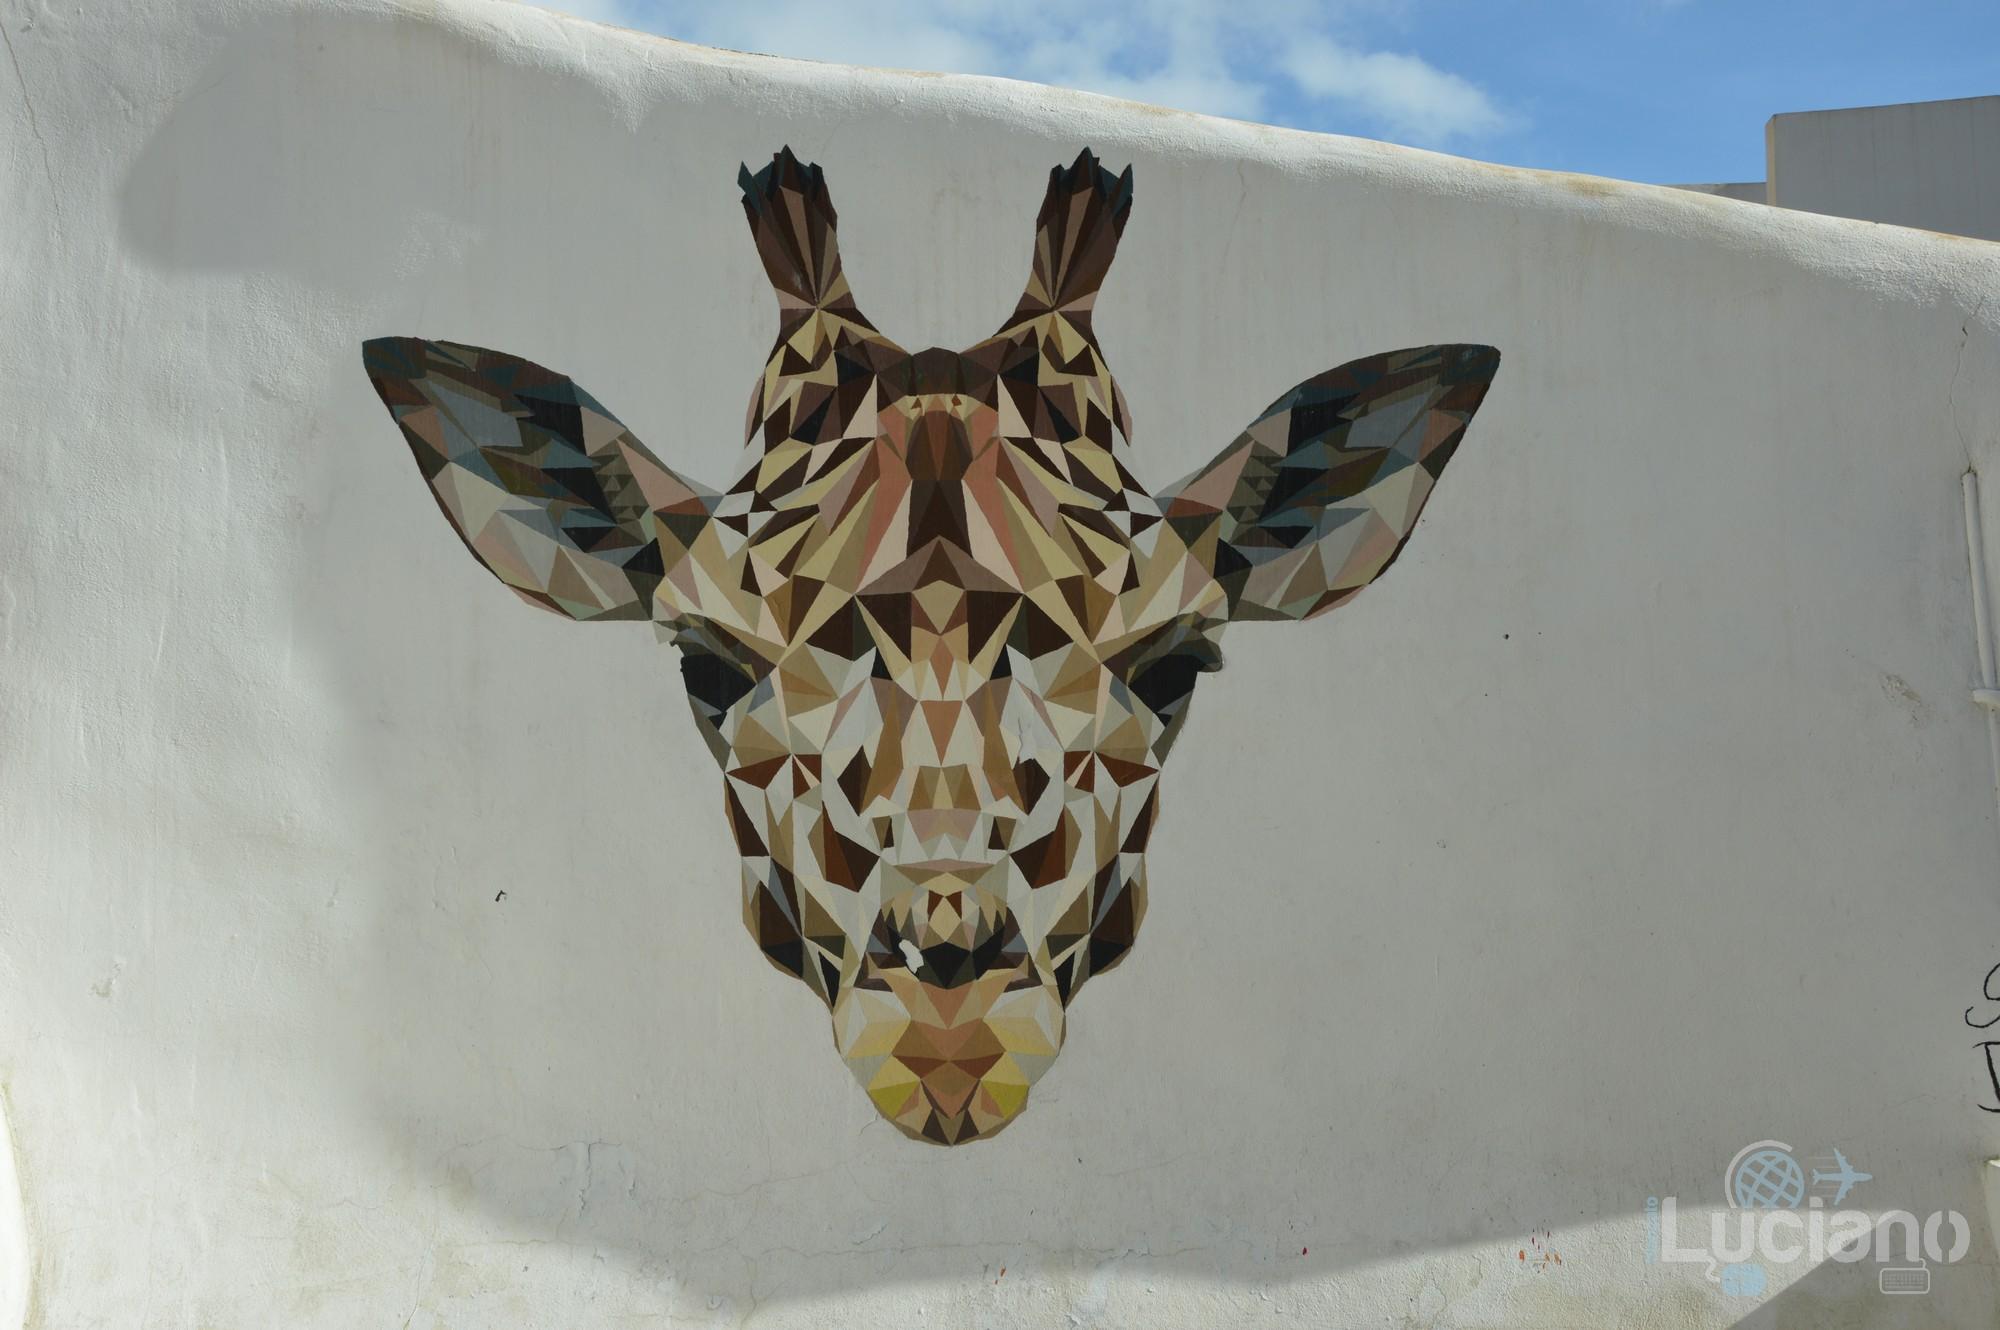 Giraffa simbolo del Farm Cultural Park a Favara (AG)